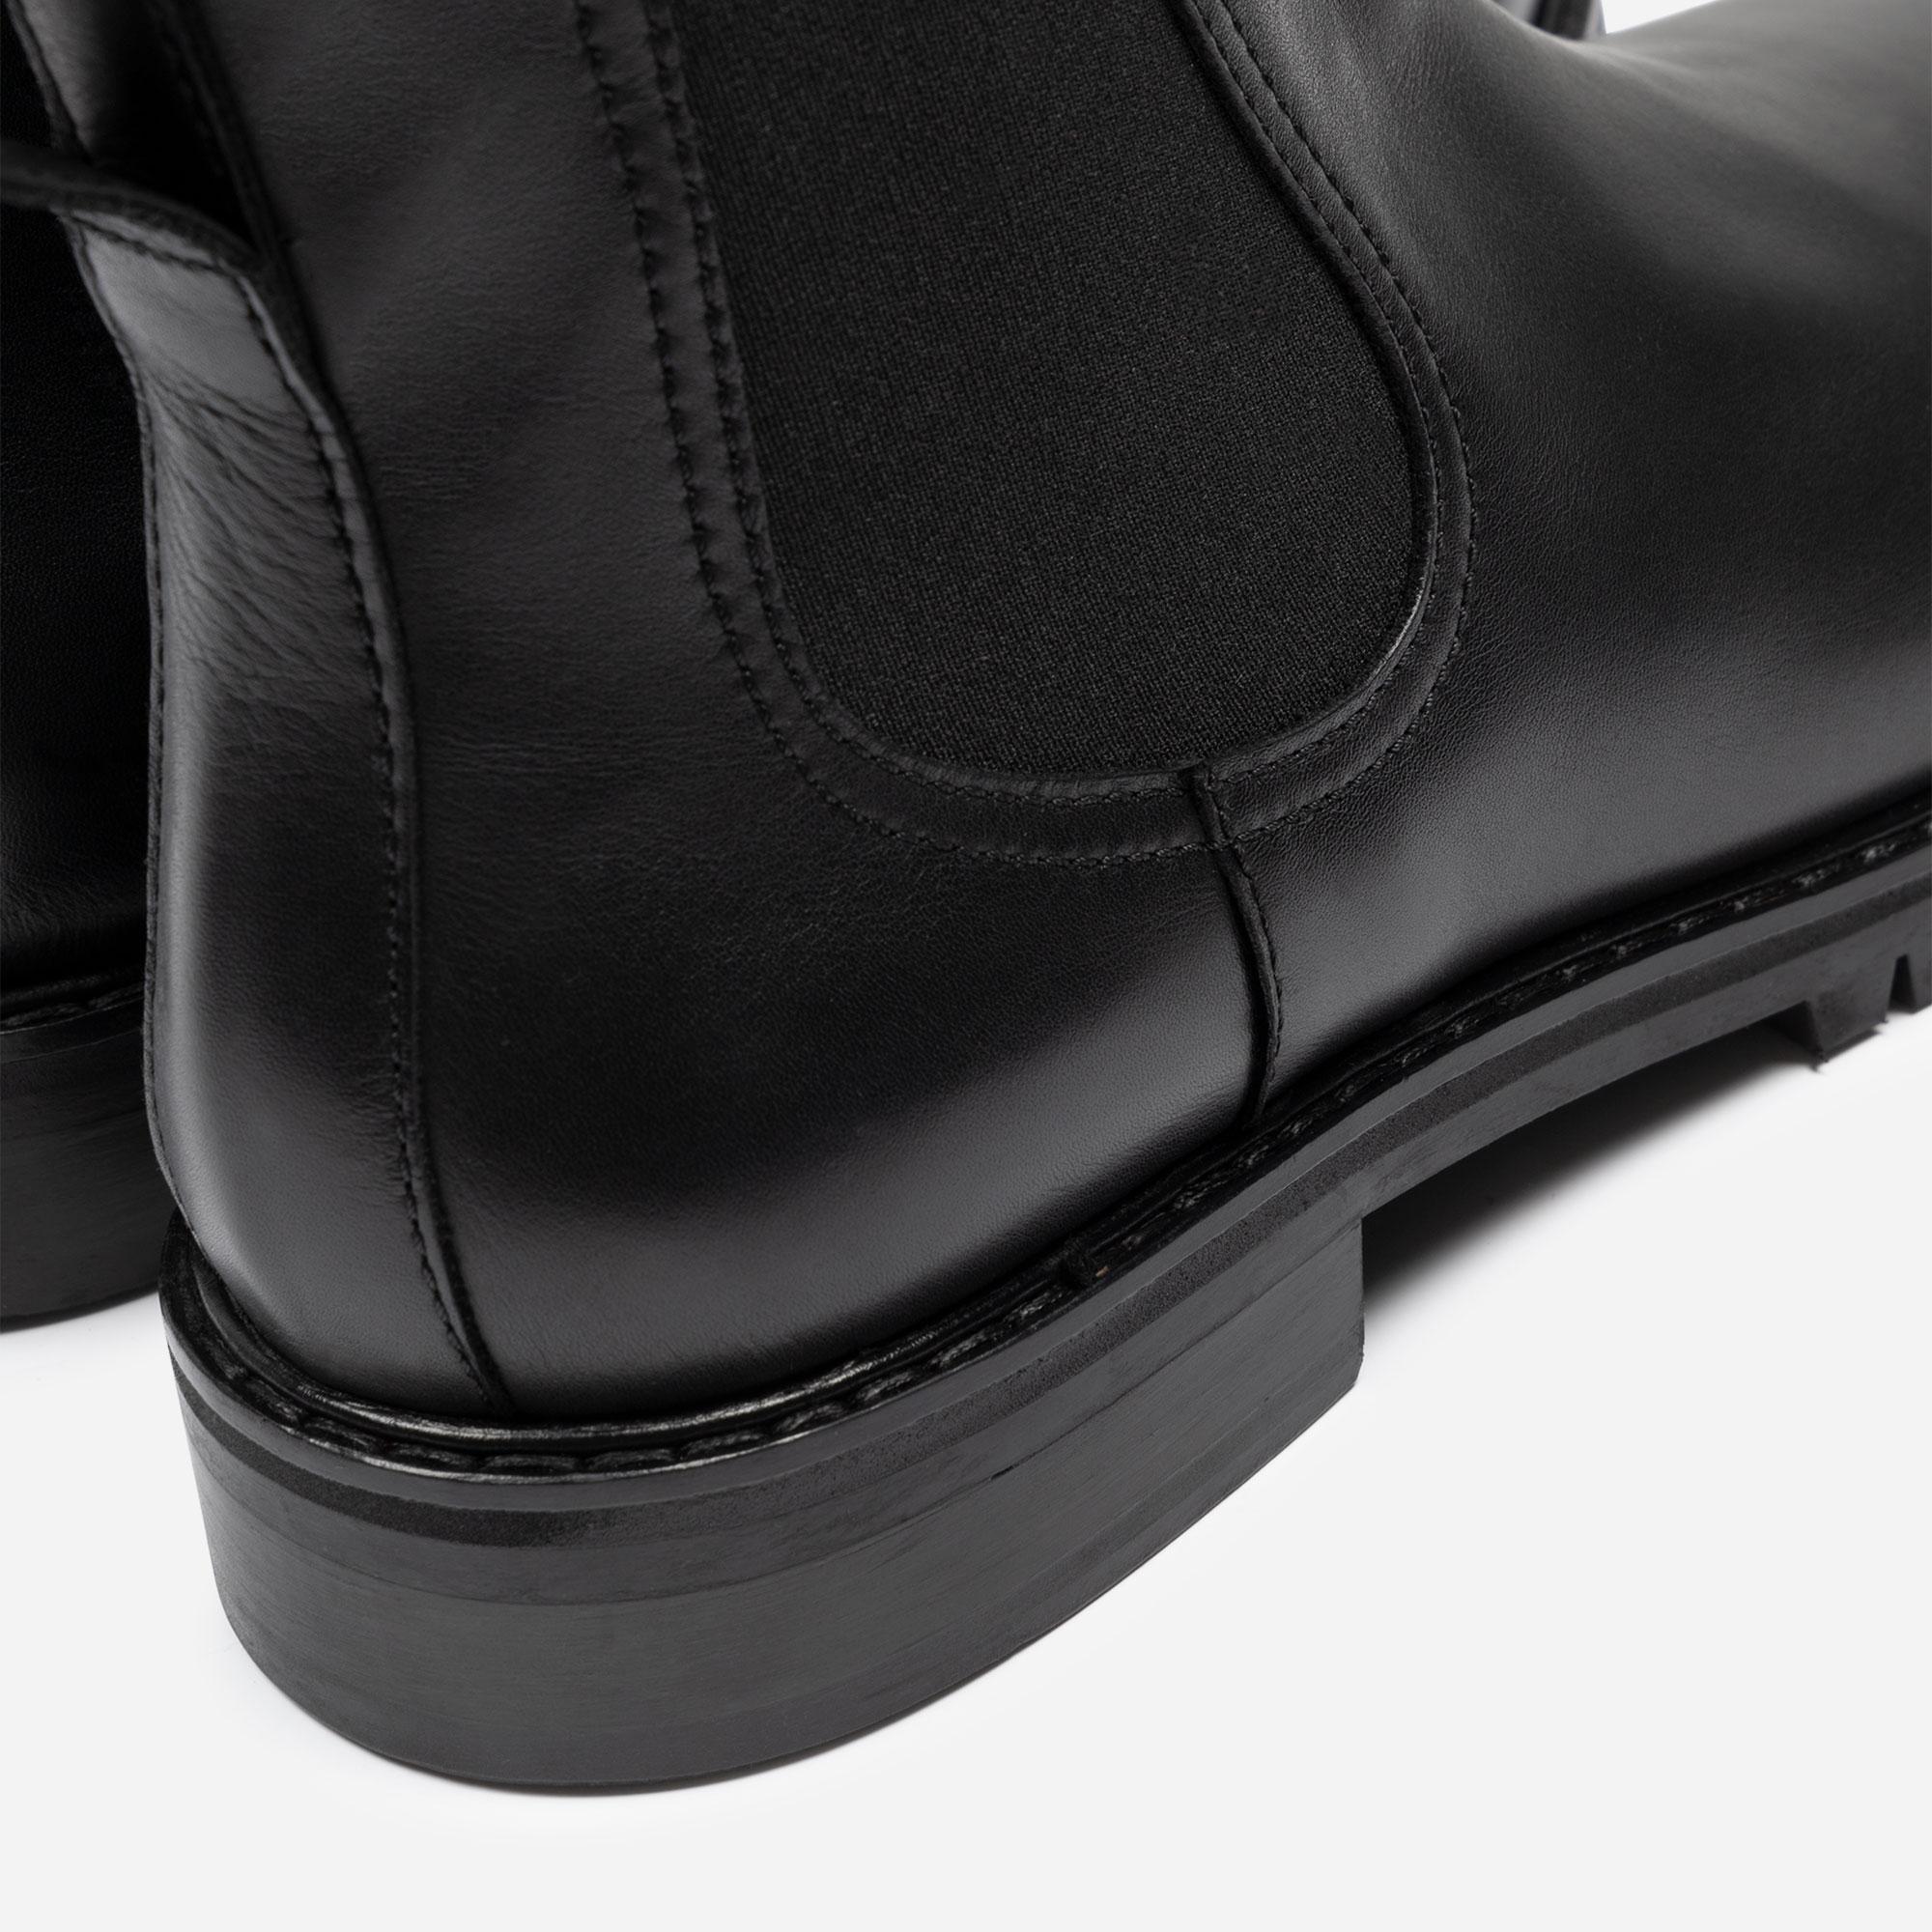 Teym - The Chelsea Boot - Black - 12